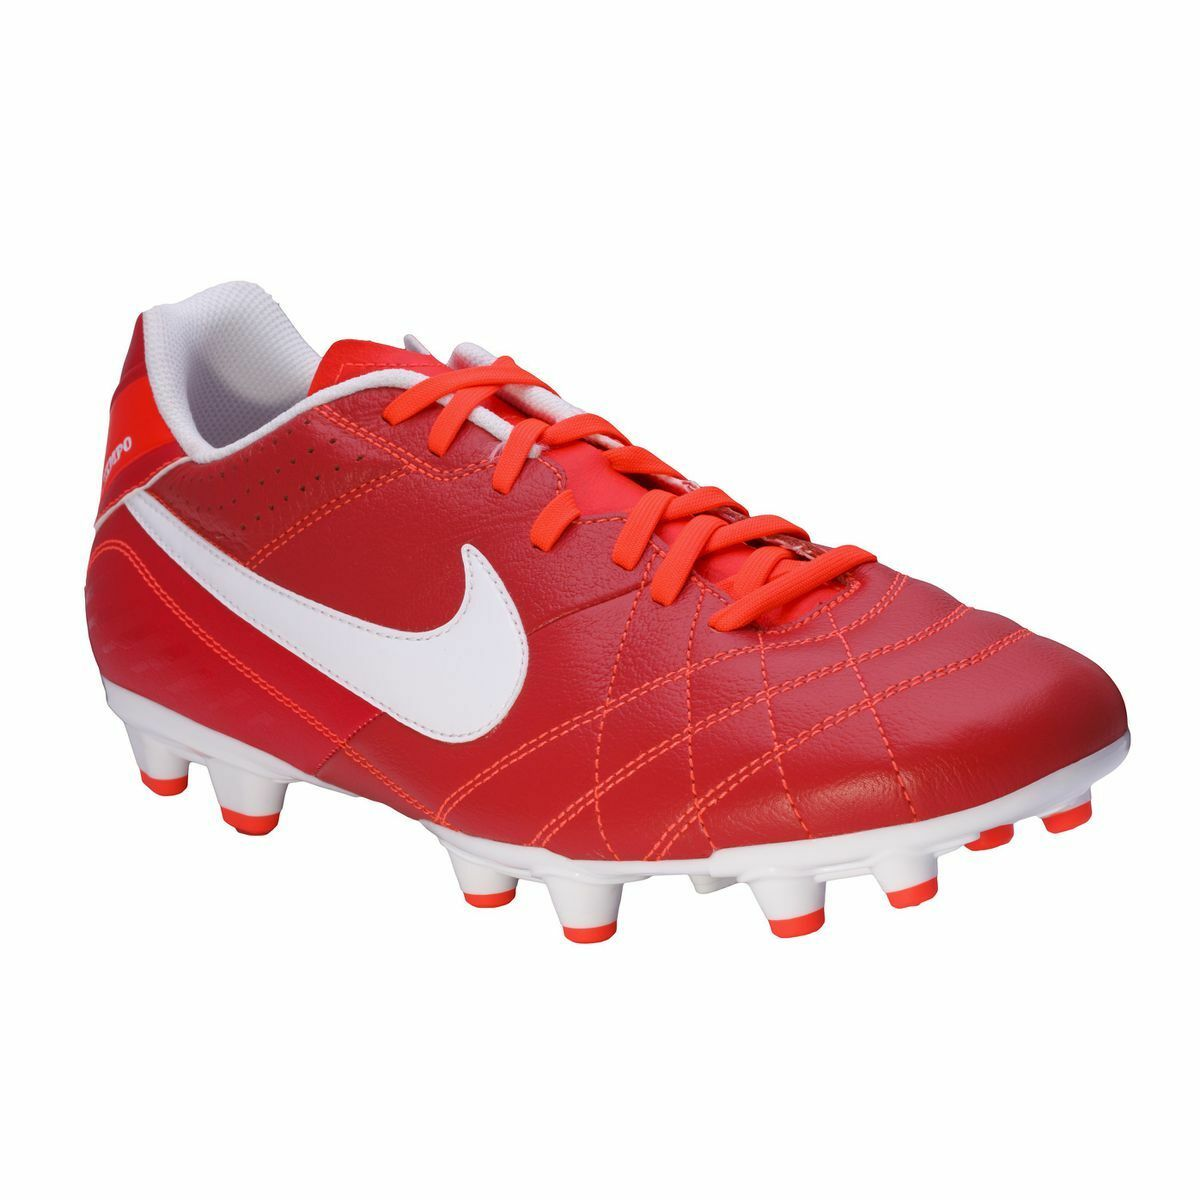 Nike Men's Tiempo Natural Iv Leather Fg botas De Fútbol-Rojo-UK 6-Nuevo